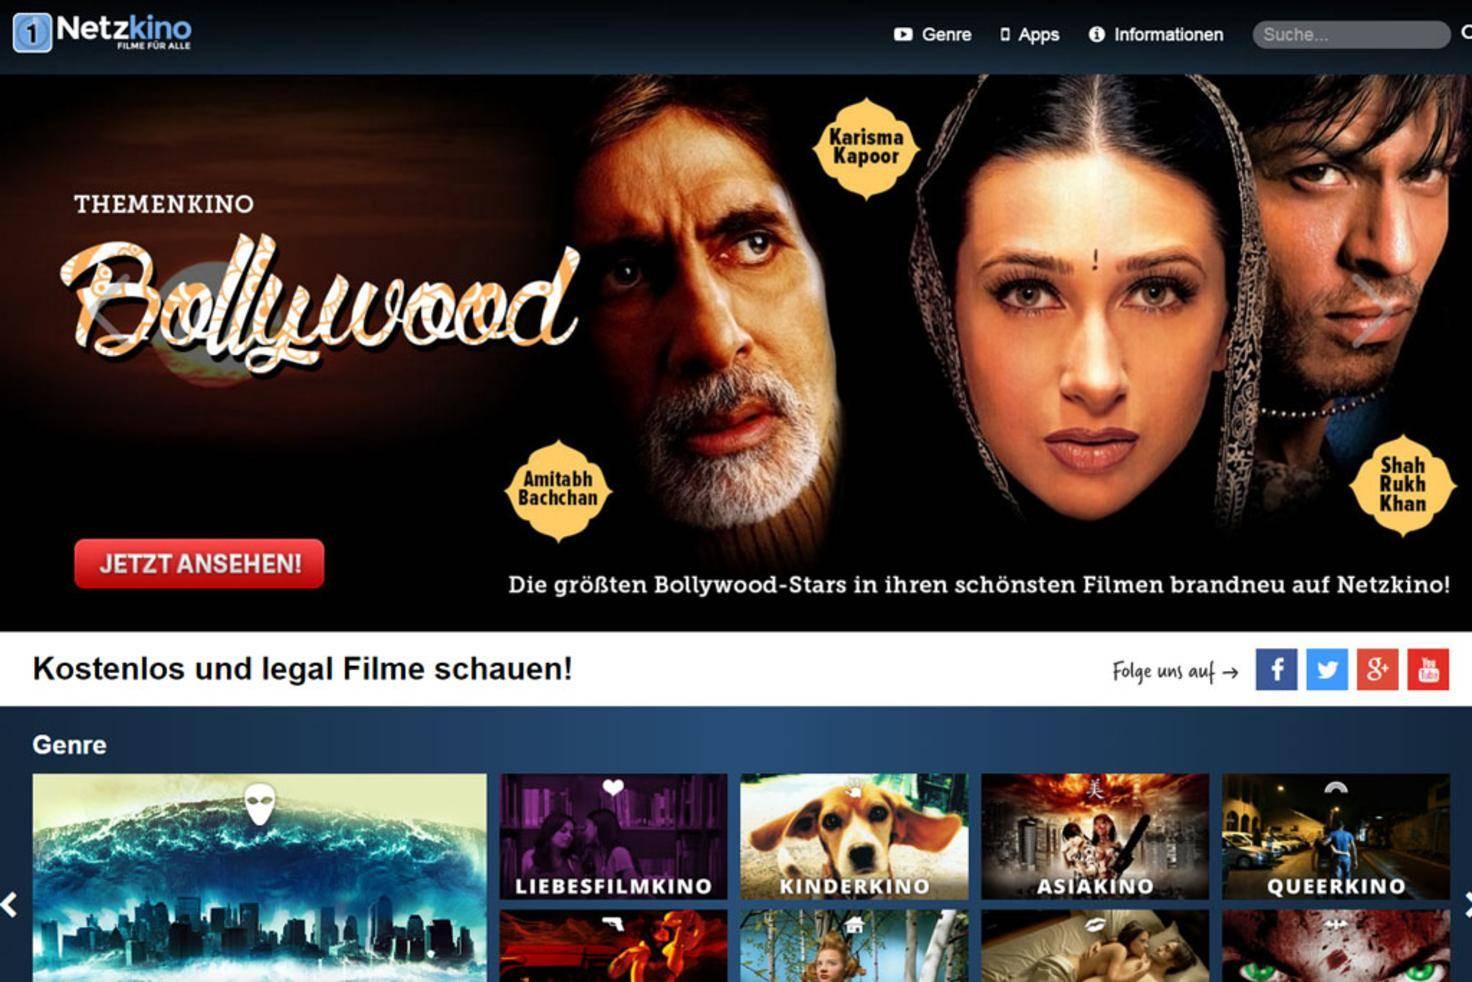 Robin Hood Kika Youtube Genial E Kostenlos En Hier Gibt S Legales Gratis Kino Bilder